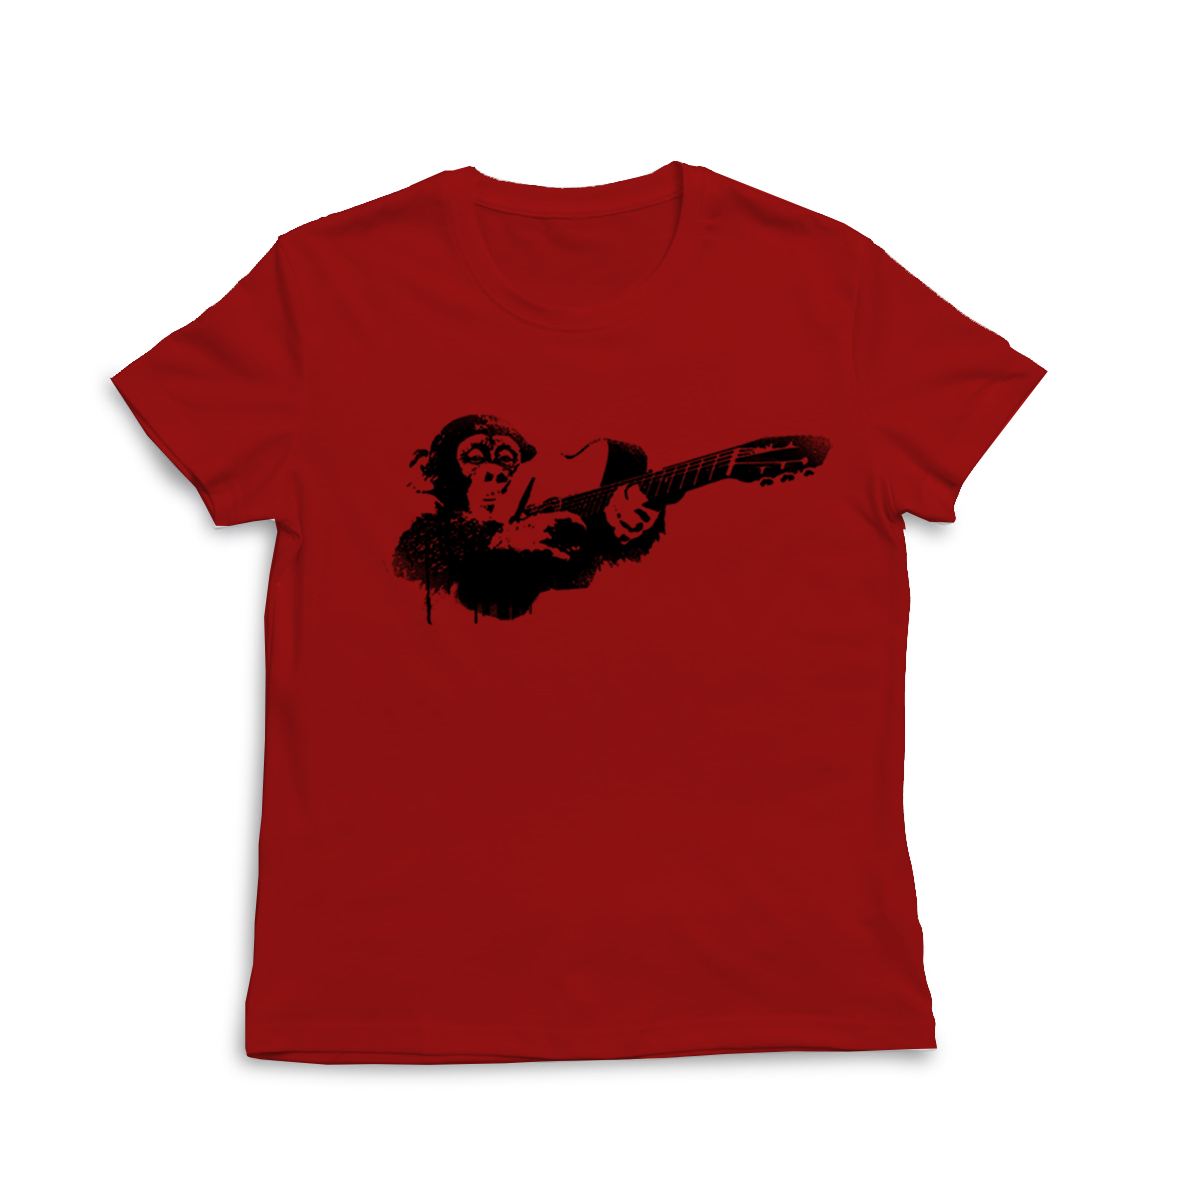 """Affe"" T-Shirts Herren/Damen (rot/schwarz) - € 20,-"